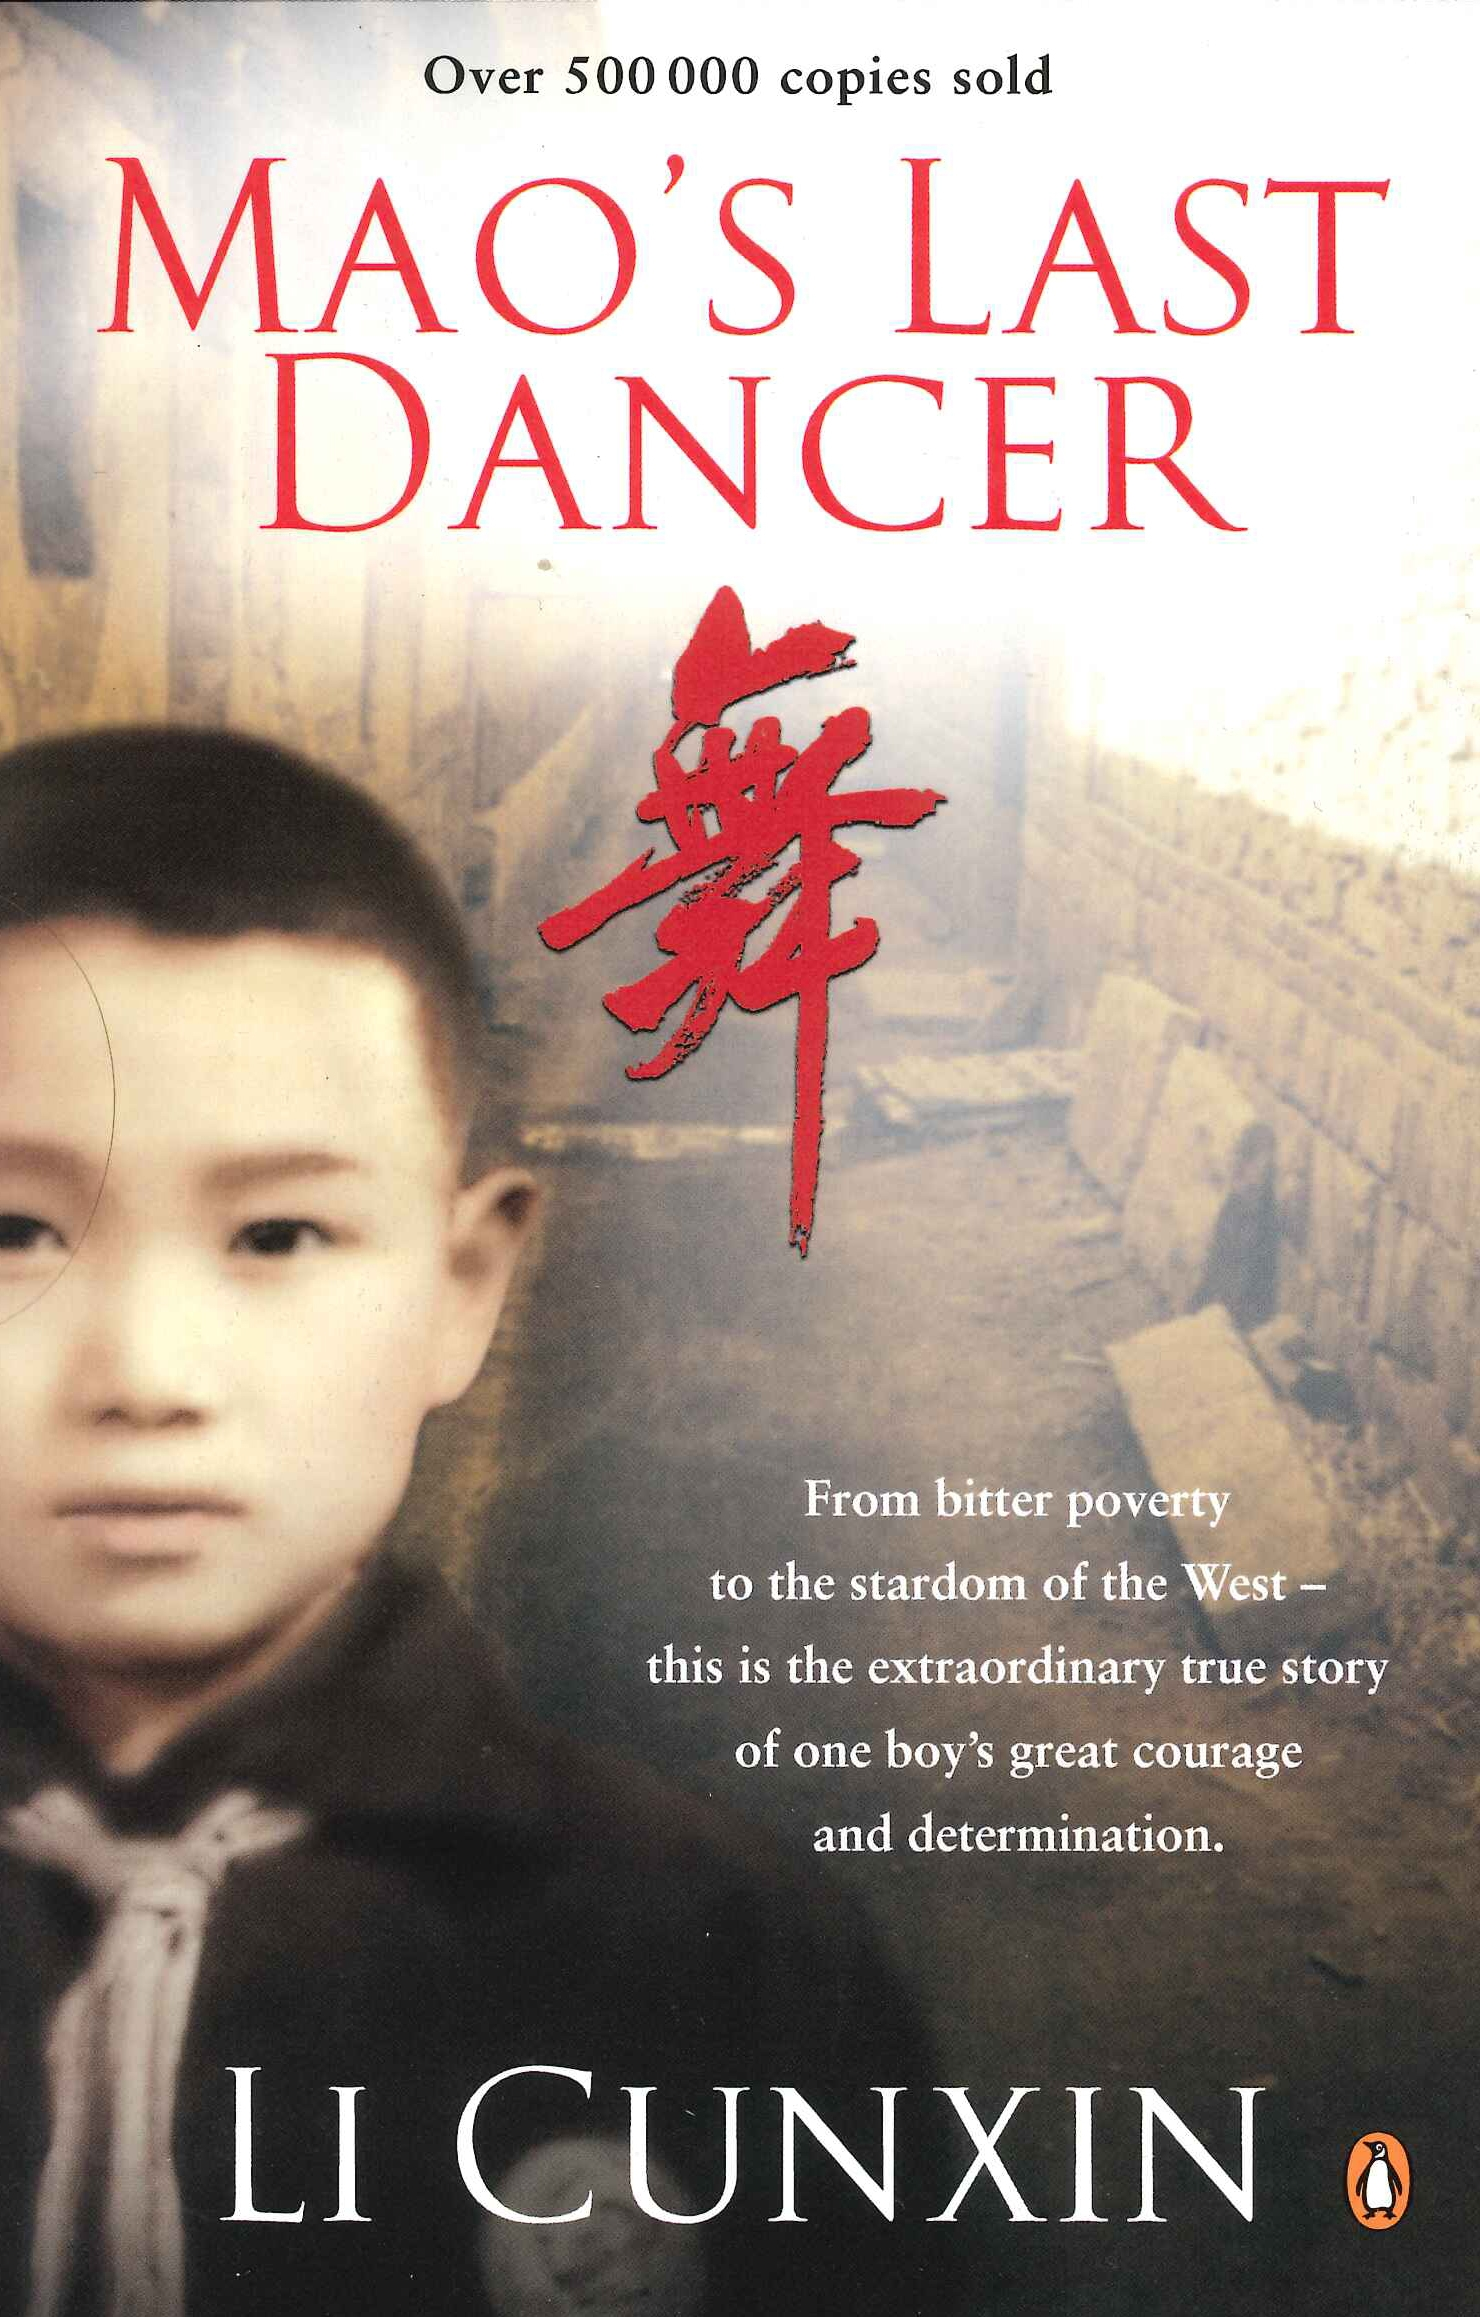 Mao's Last Dancer by Li Cunxin - Penguin Books Australia